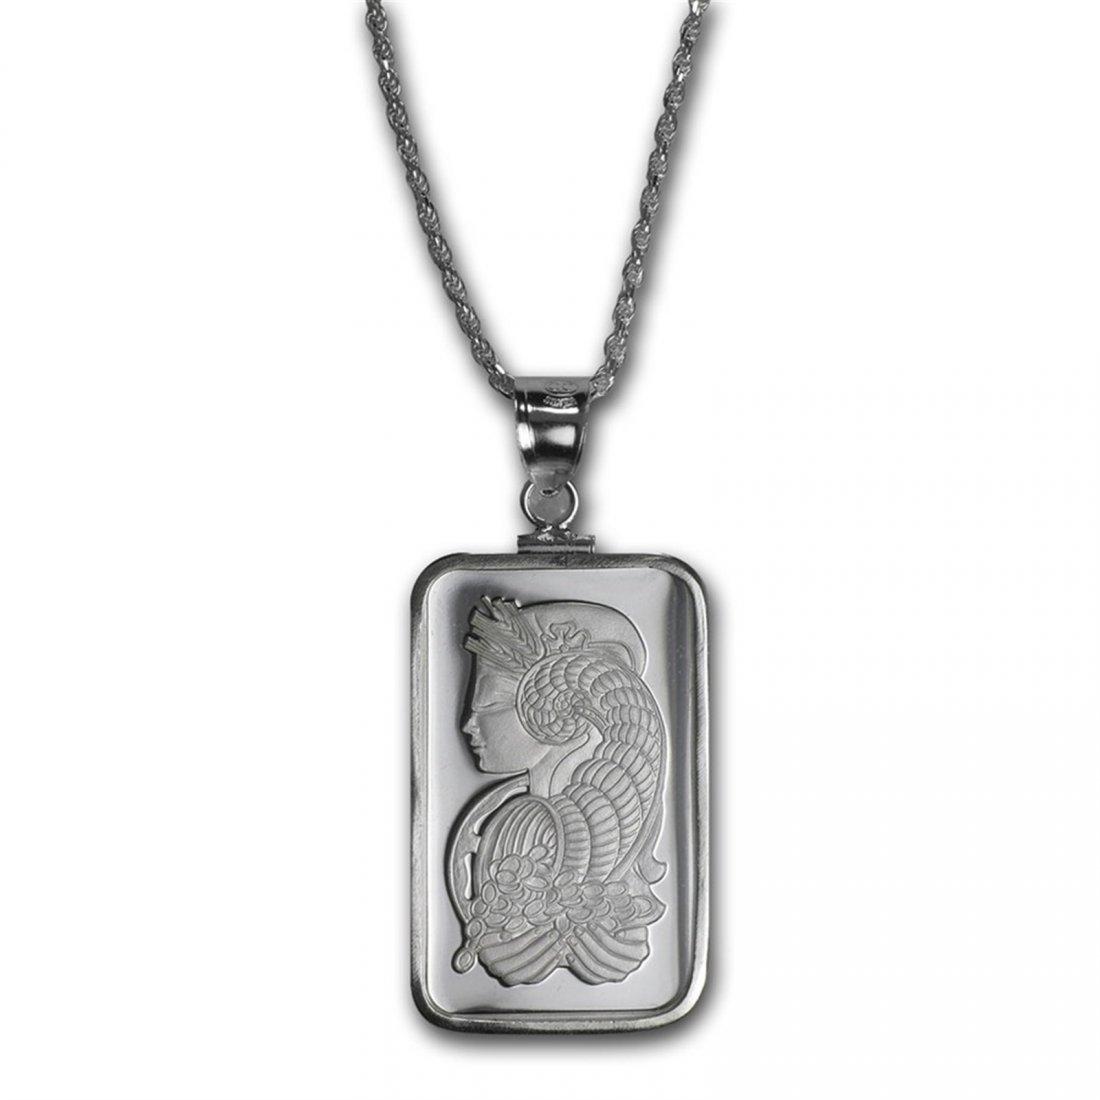 10 gram Silver - Pamp Suisse Fortuna Pendant (w/Chain)